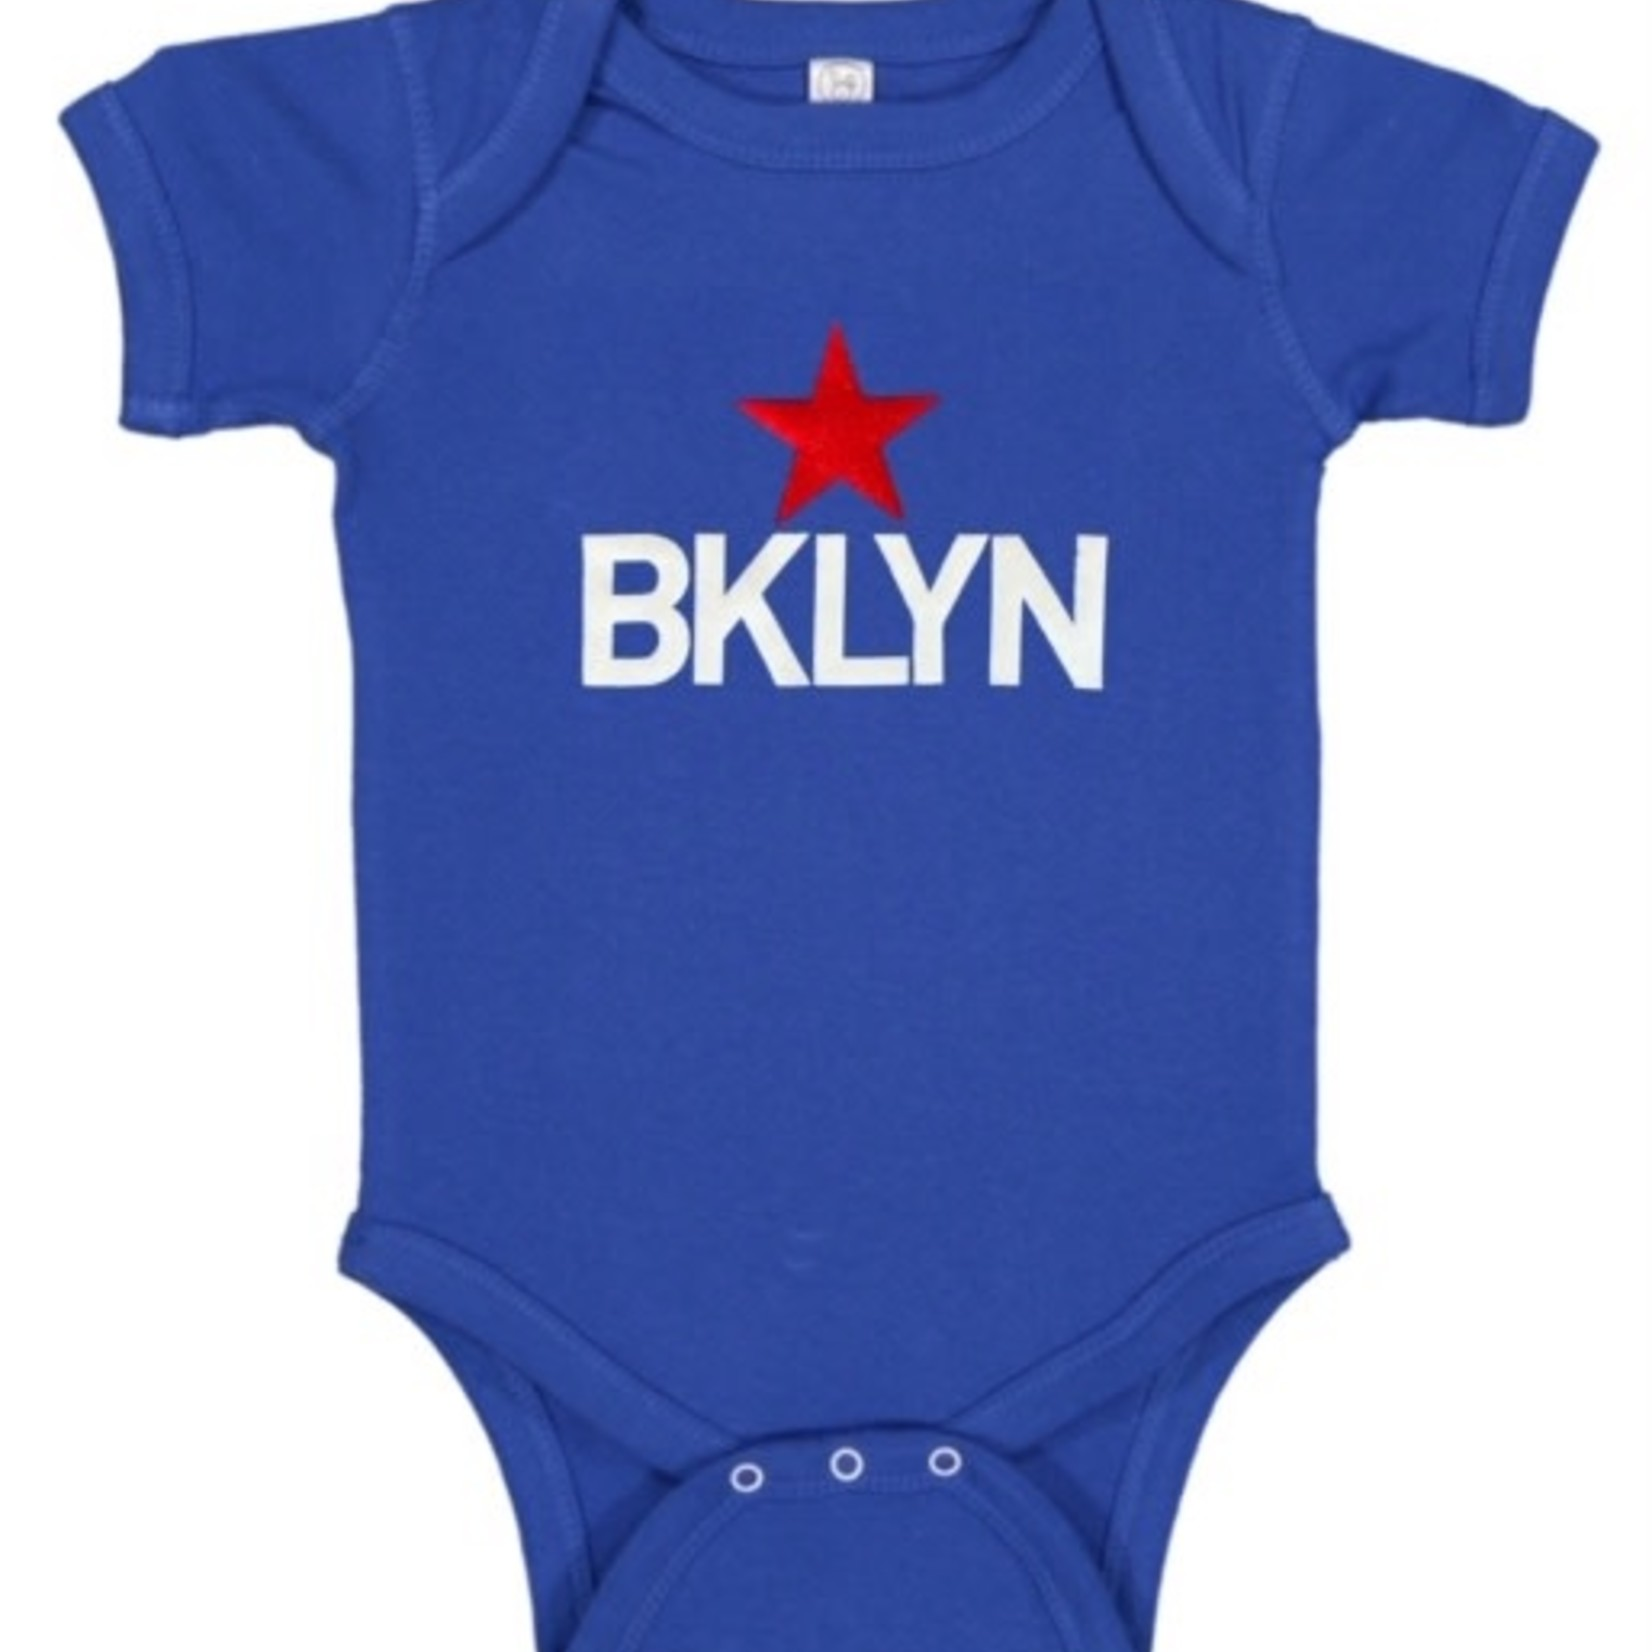 BKLYN SS Onesie